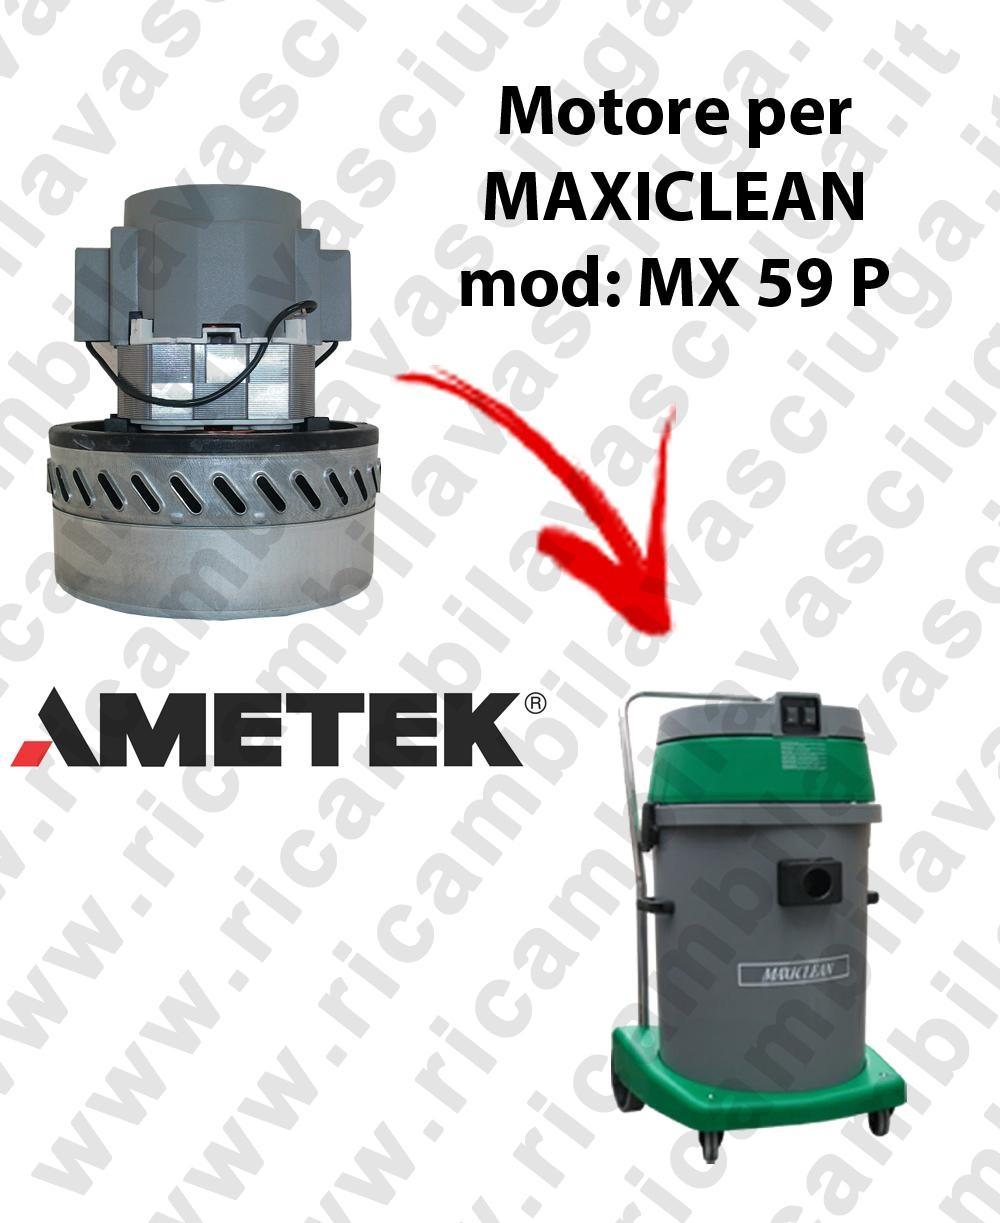 MX 59 P AMETEK vacuum motor for wet and dry vacuum cleaner MAXICLEAN